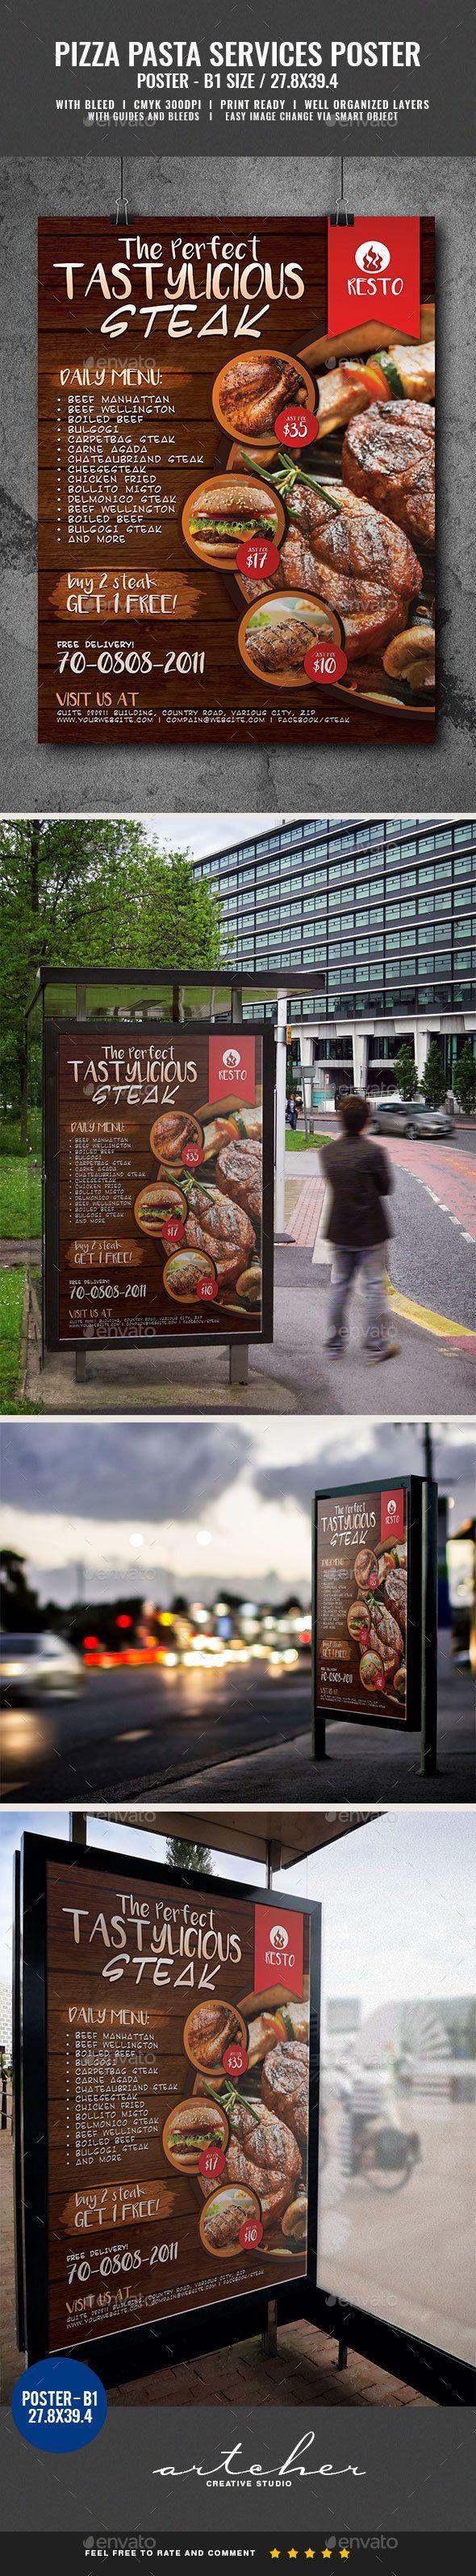 #Restaurant Fast #Food Steak Poster - #Signage Print Templates Download here: https://graphicriver.net/item/restaurant-fast-food-steak-poster/20051167?ref=alena994